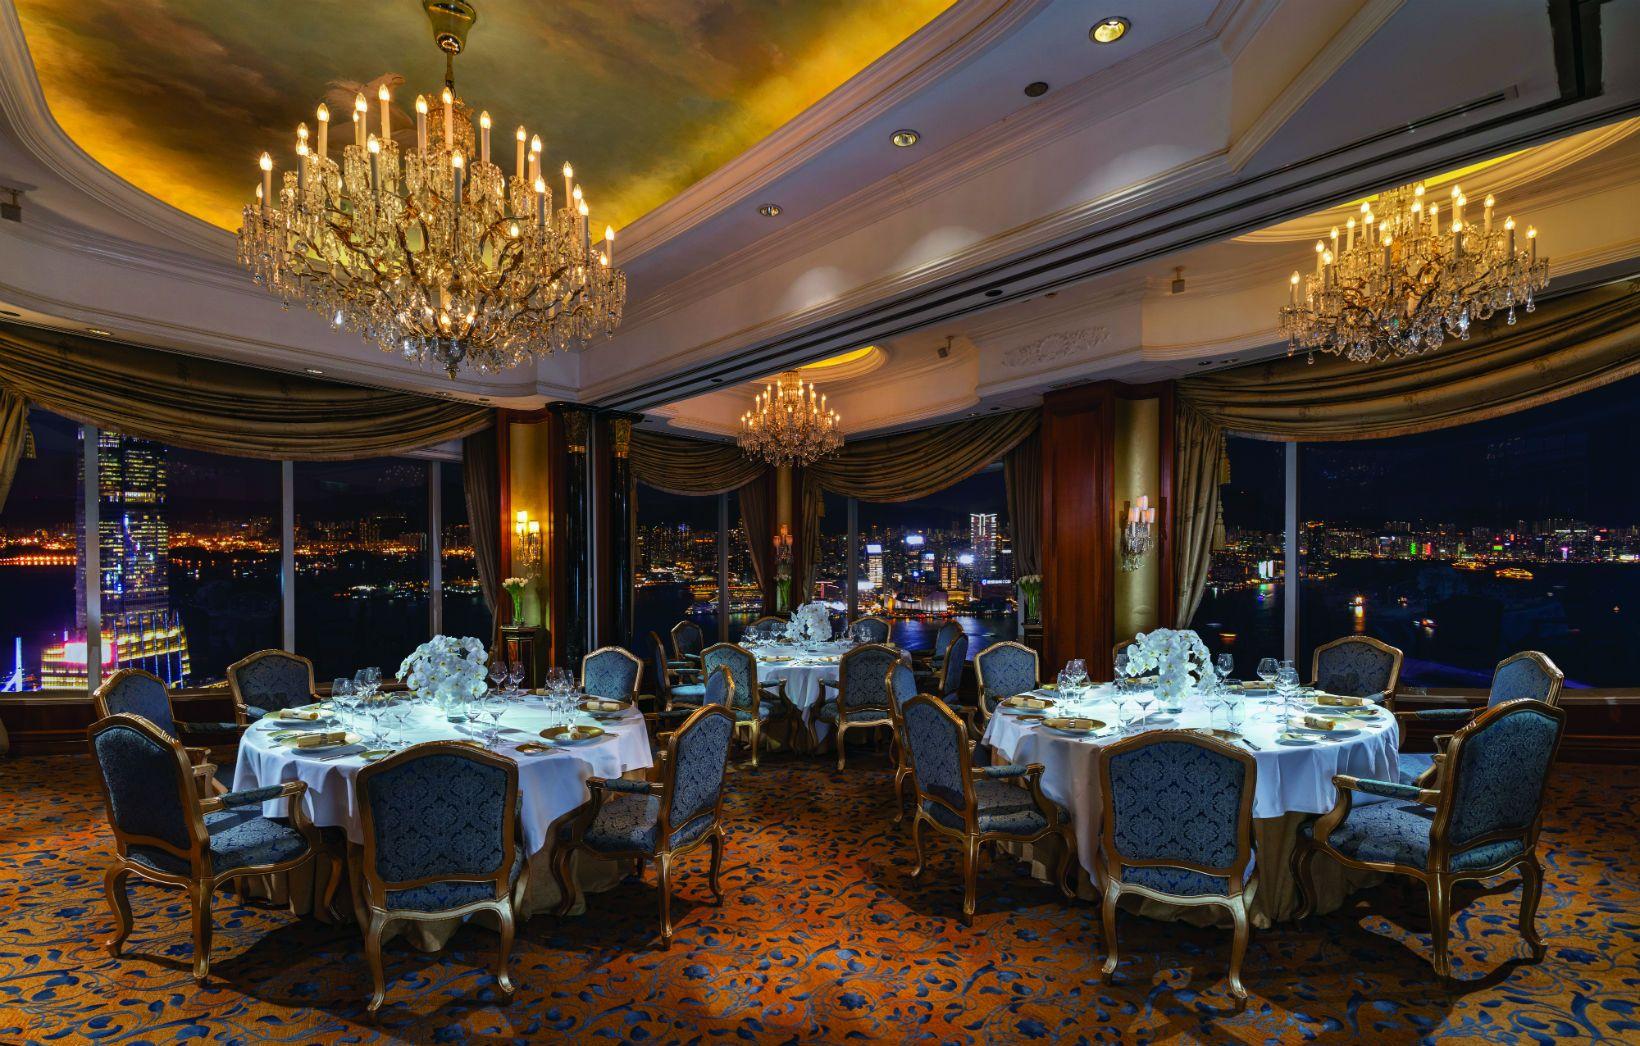 Enjoy The Last Supper From The Titanic At Island Shangri-La, Hong Kong